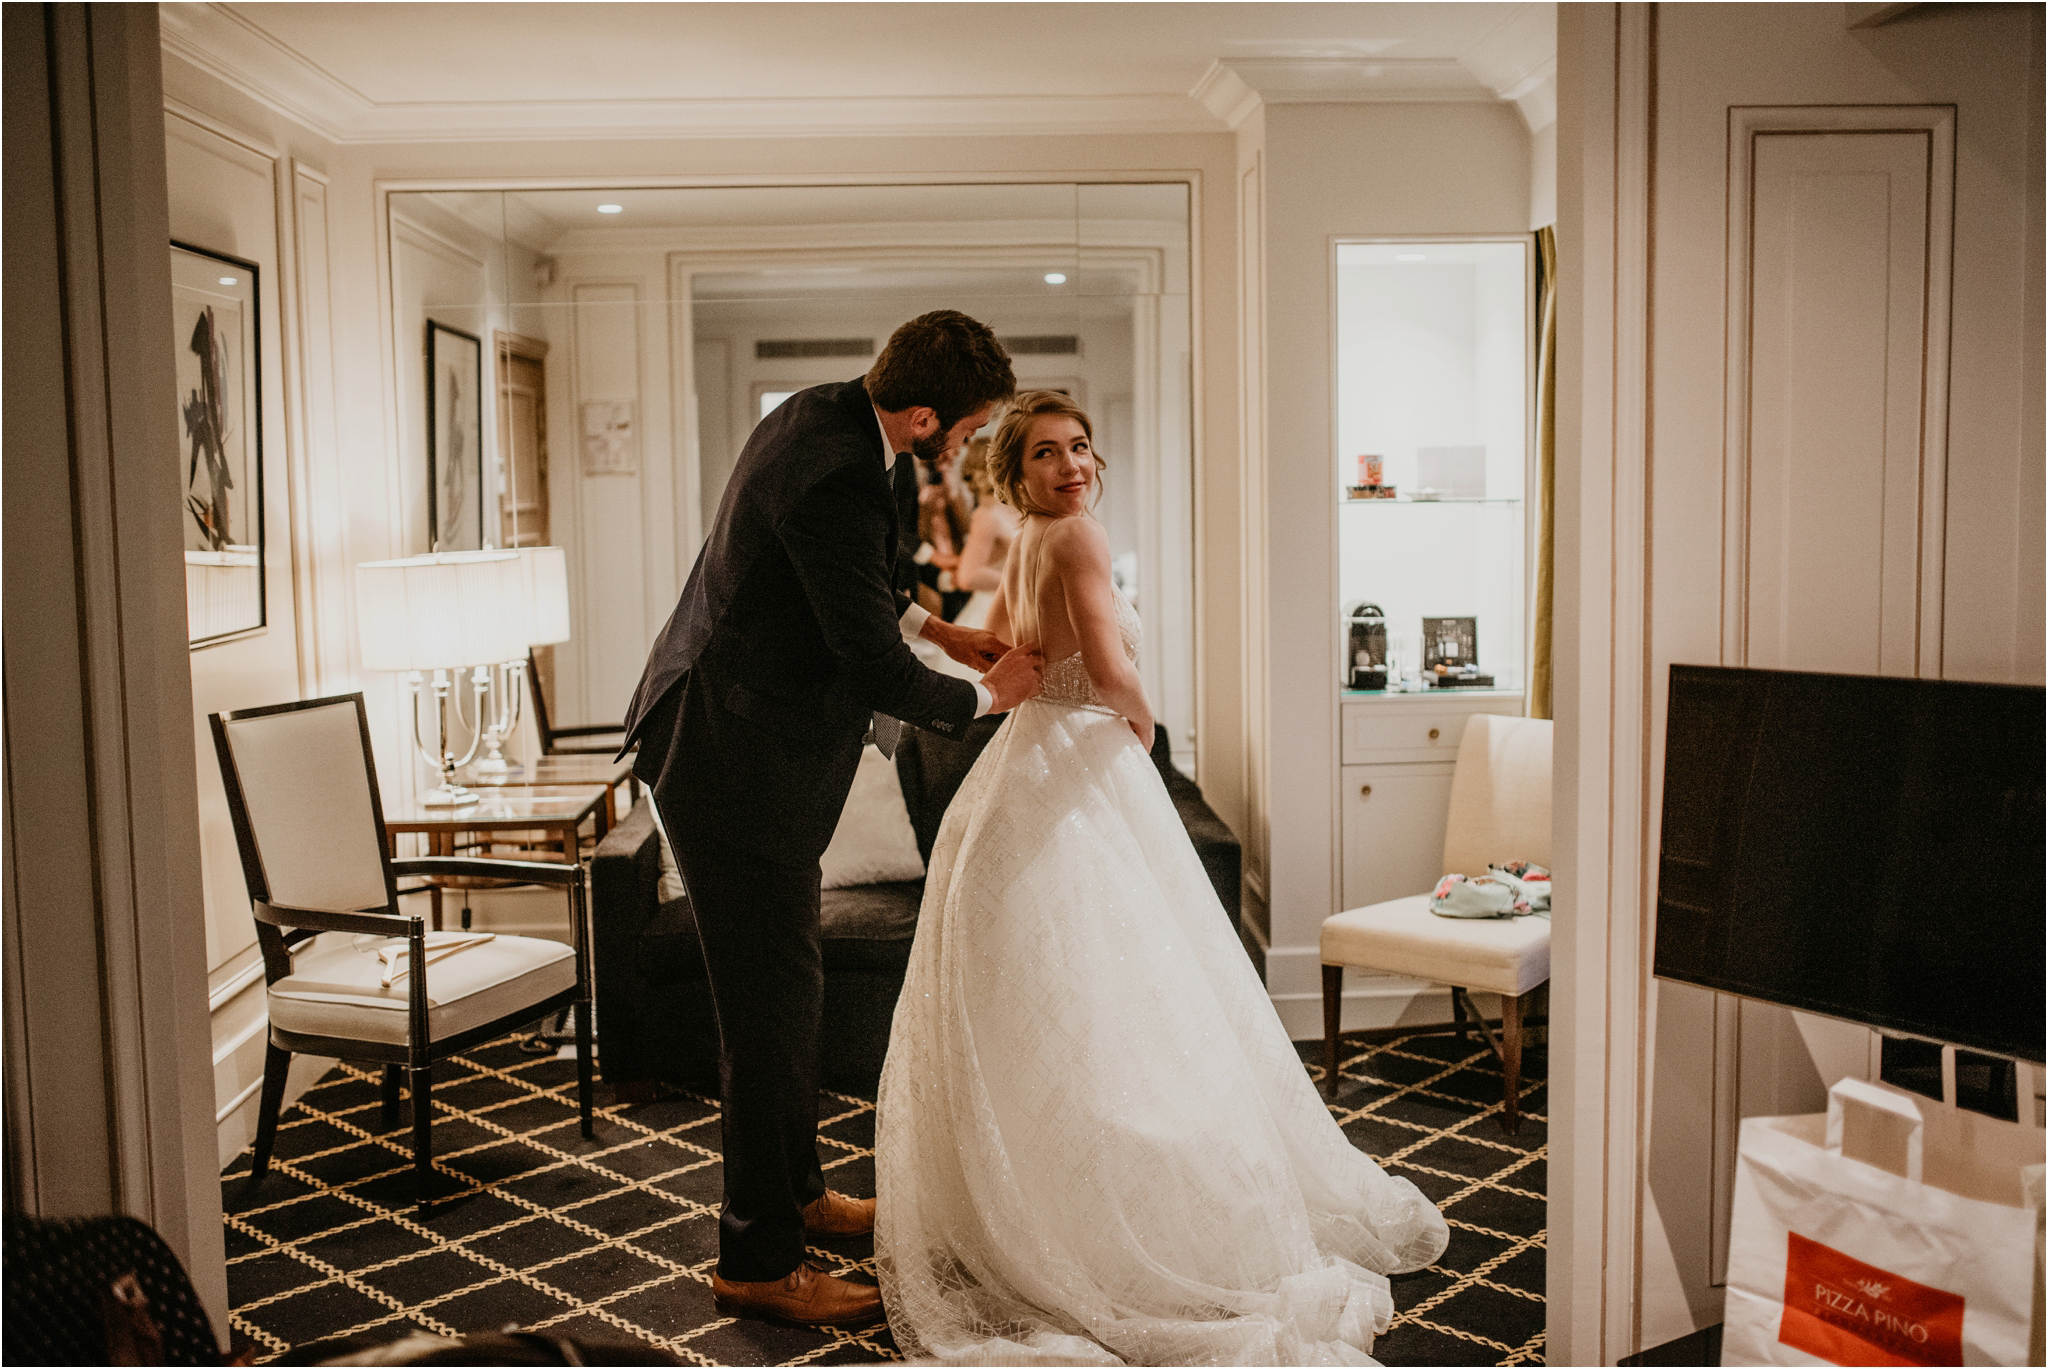 miranda-and-jared-paris-elopement-destination-wedding-photographer-014.jpg